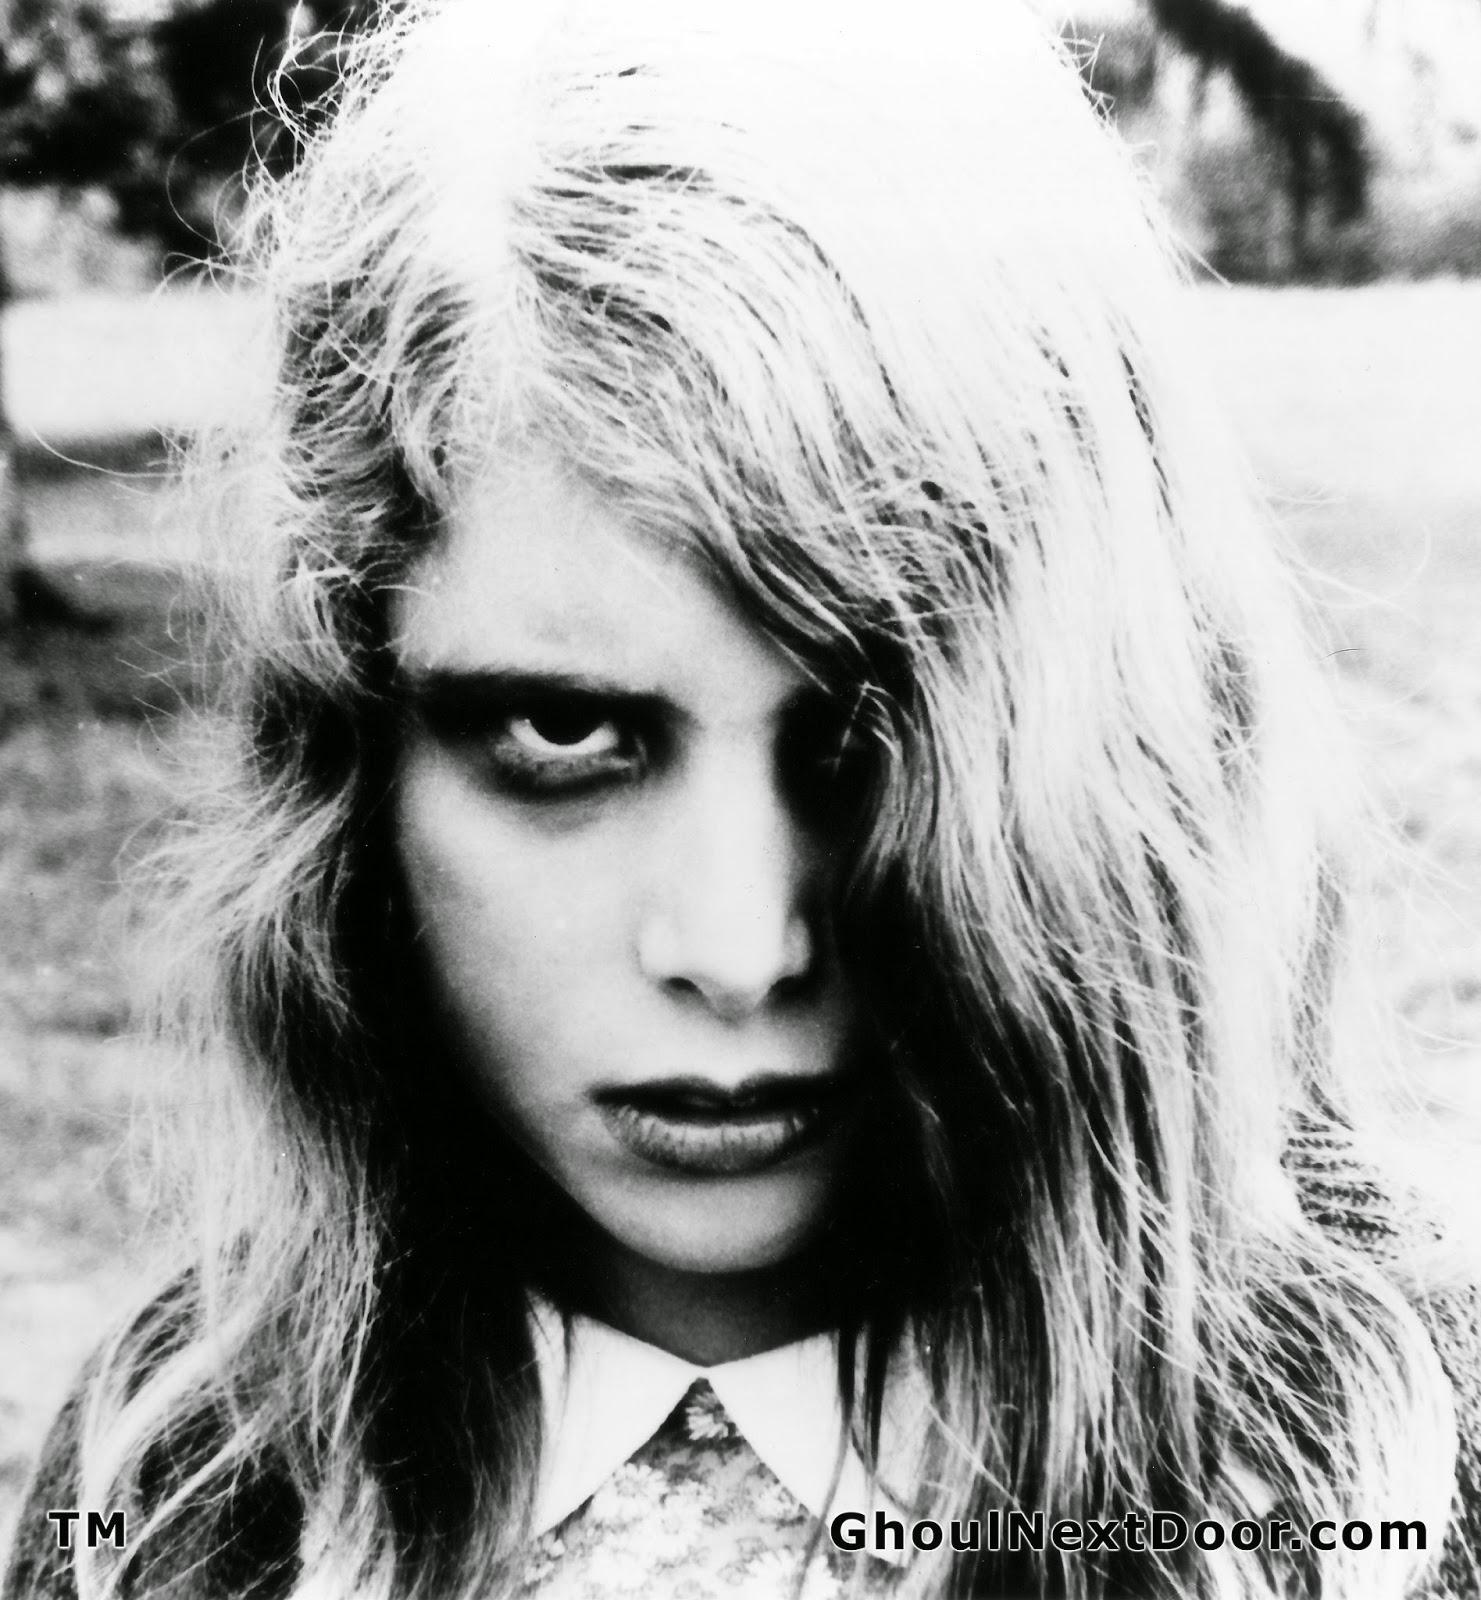 Groovy Doom: Kyra Schon -- iconic Living Dead Girl ...